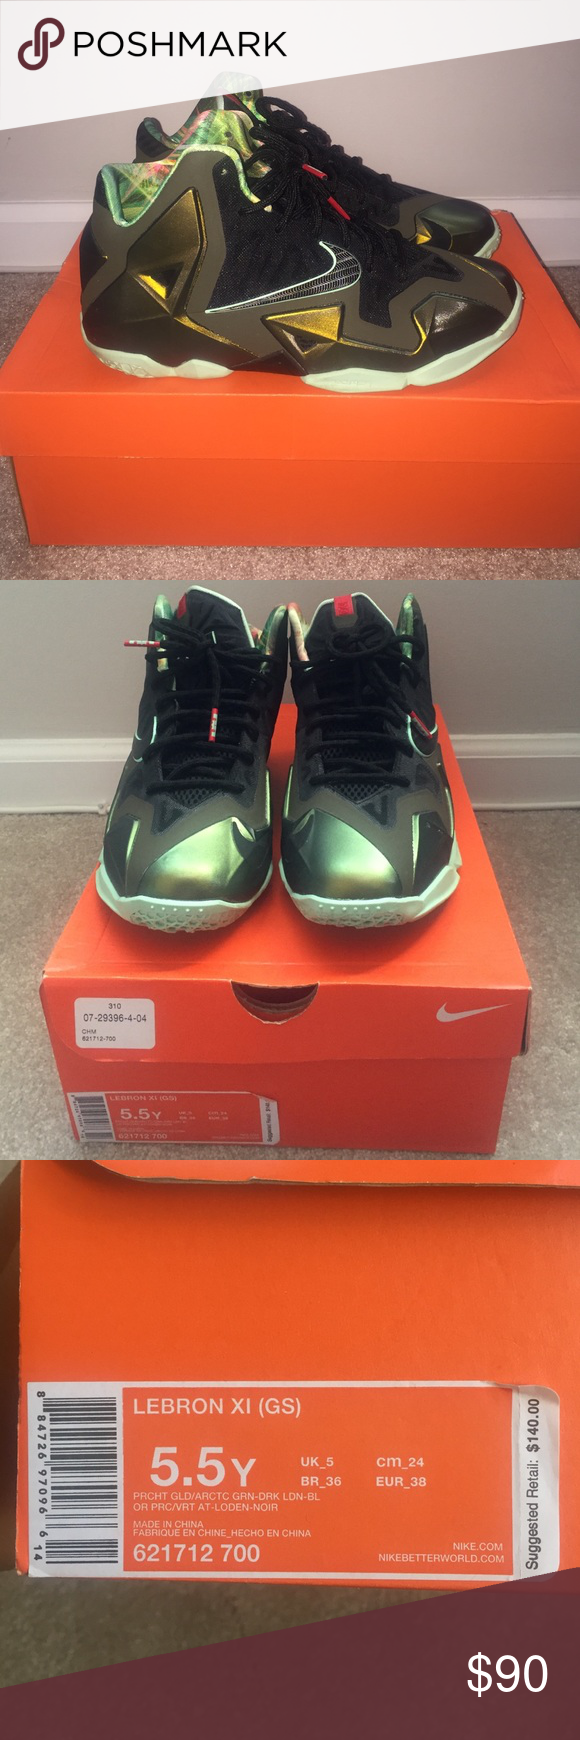 newest collection 616b2 913a5 Nike Lebron XI (GS) Nike Lebron XI. Basketball sneakers. Gold green